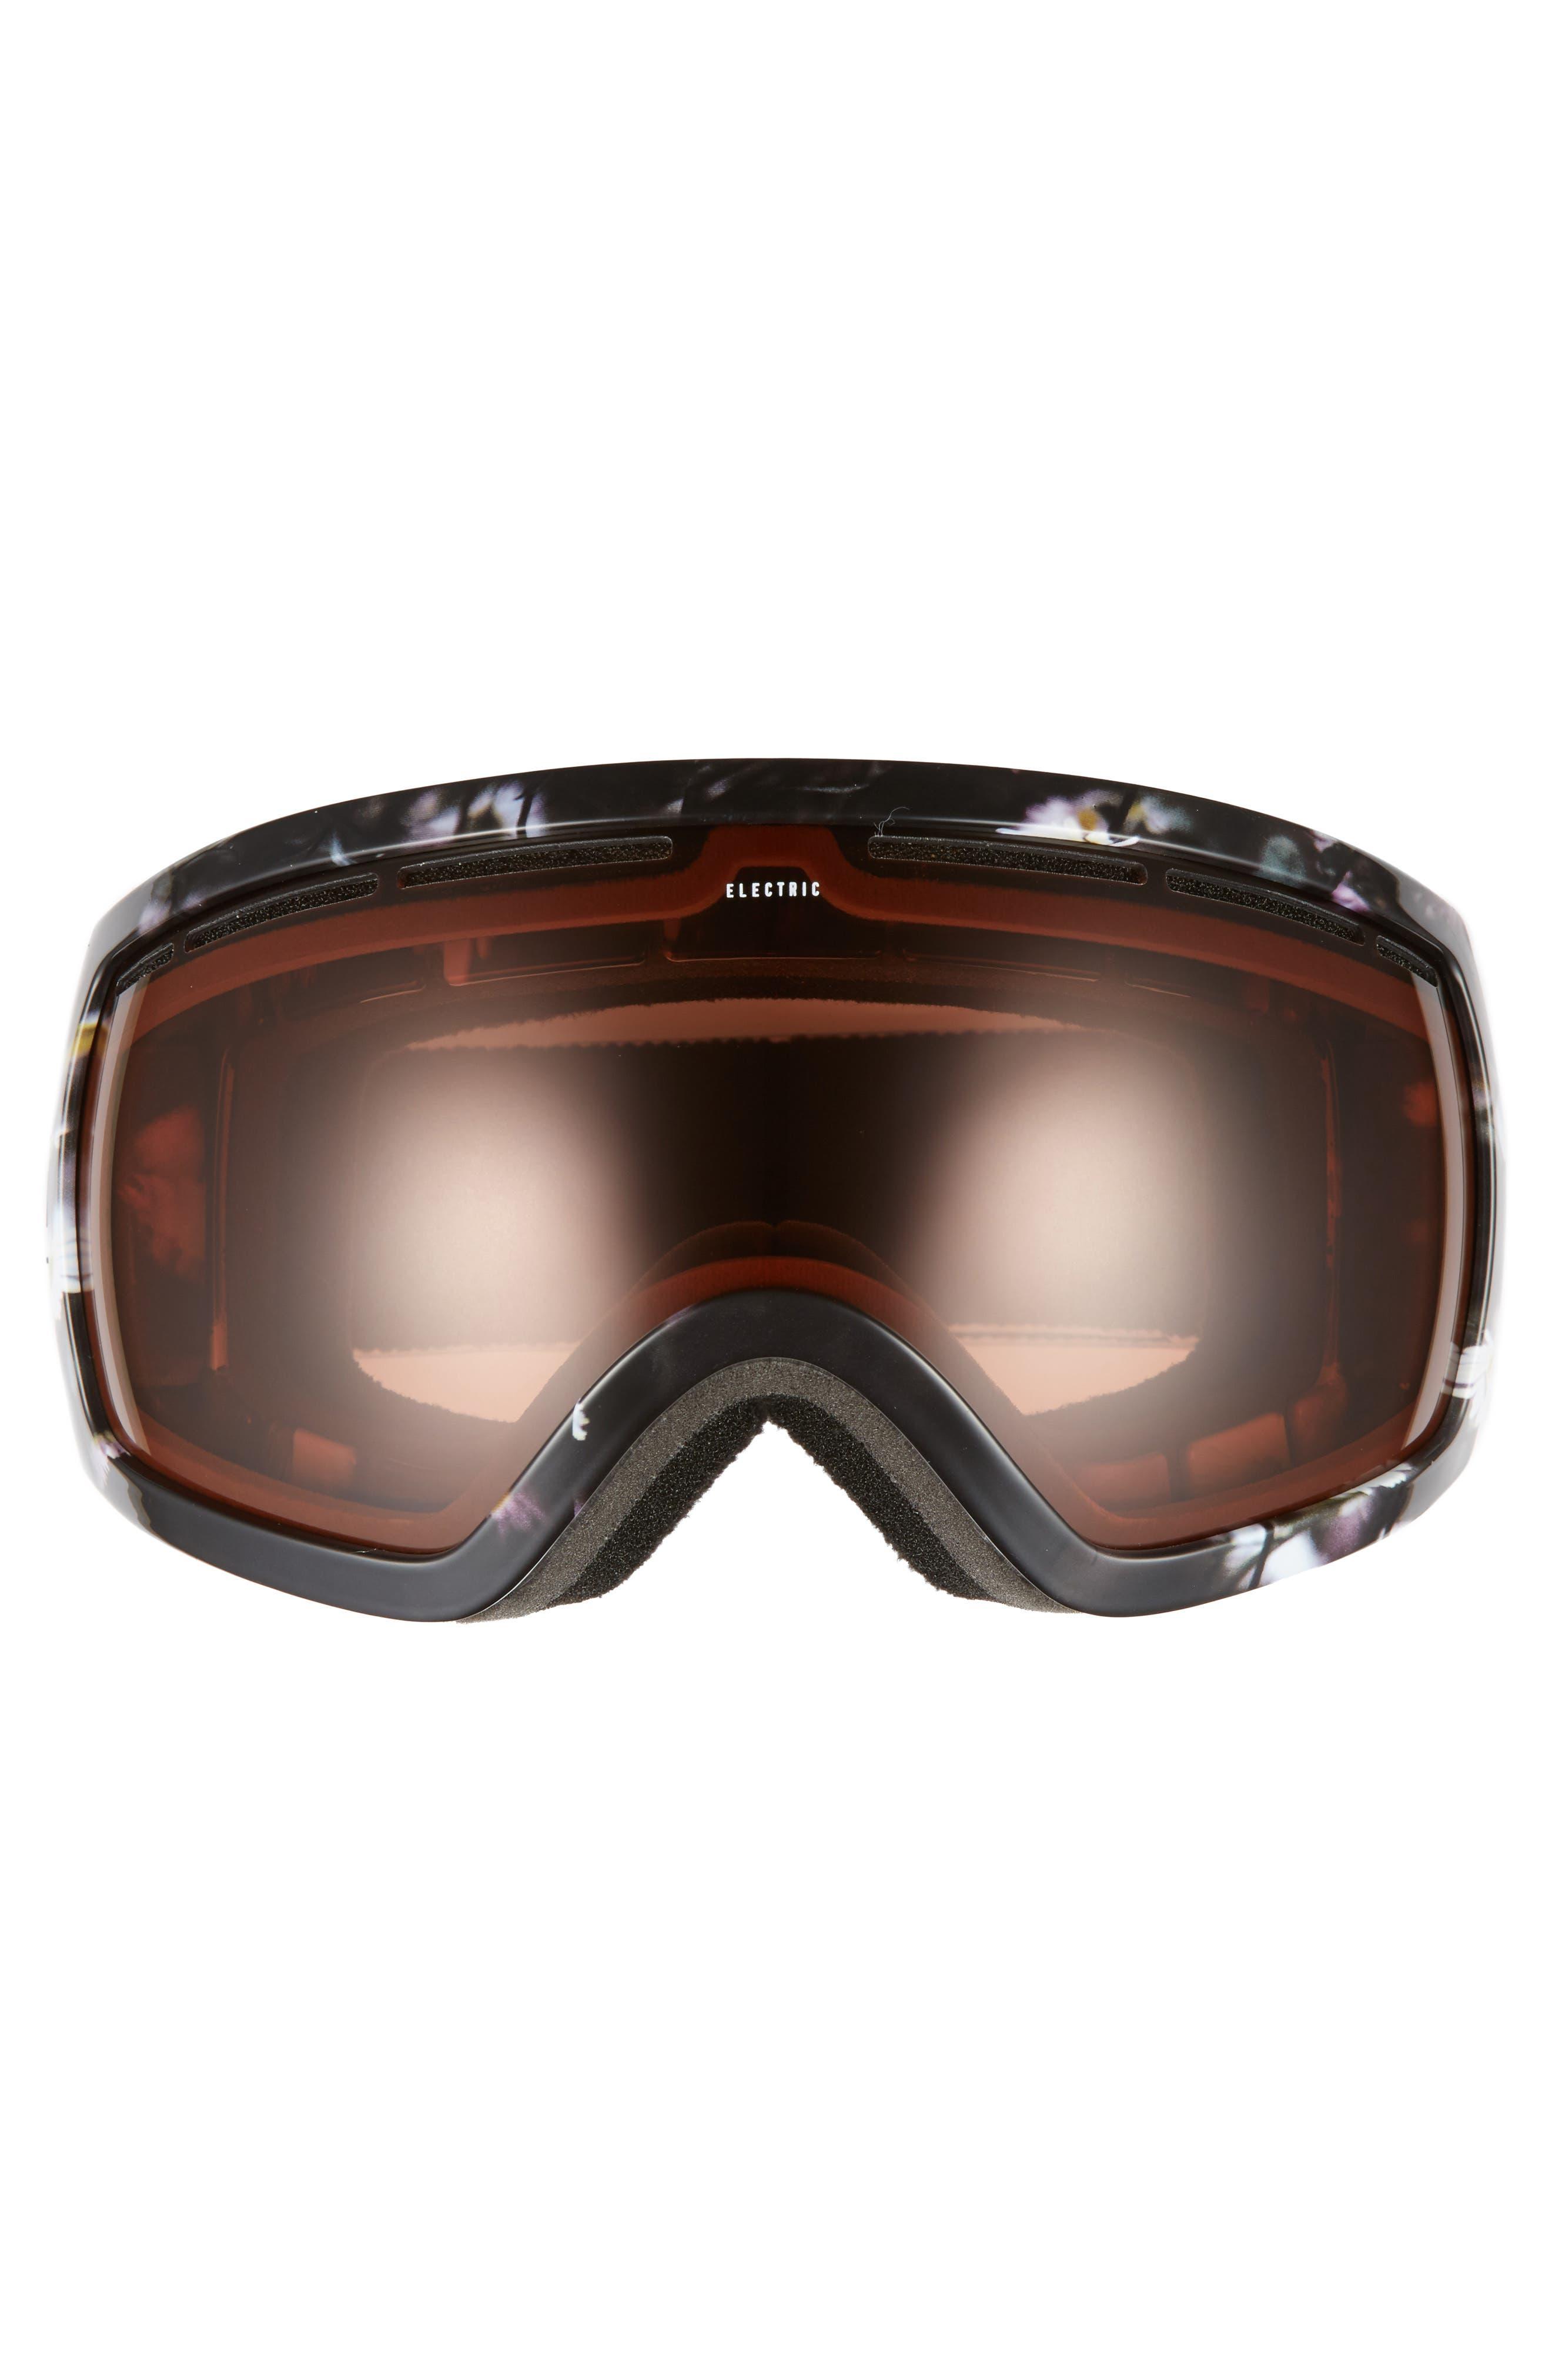 EG2.5 Snow Goggles,                             Alternate thumbnail 18, color,